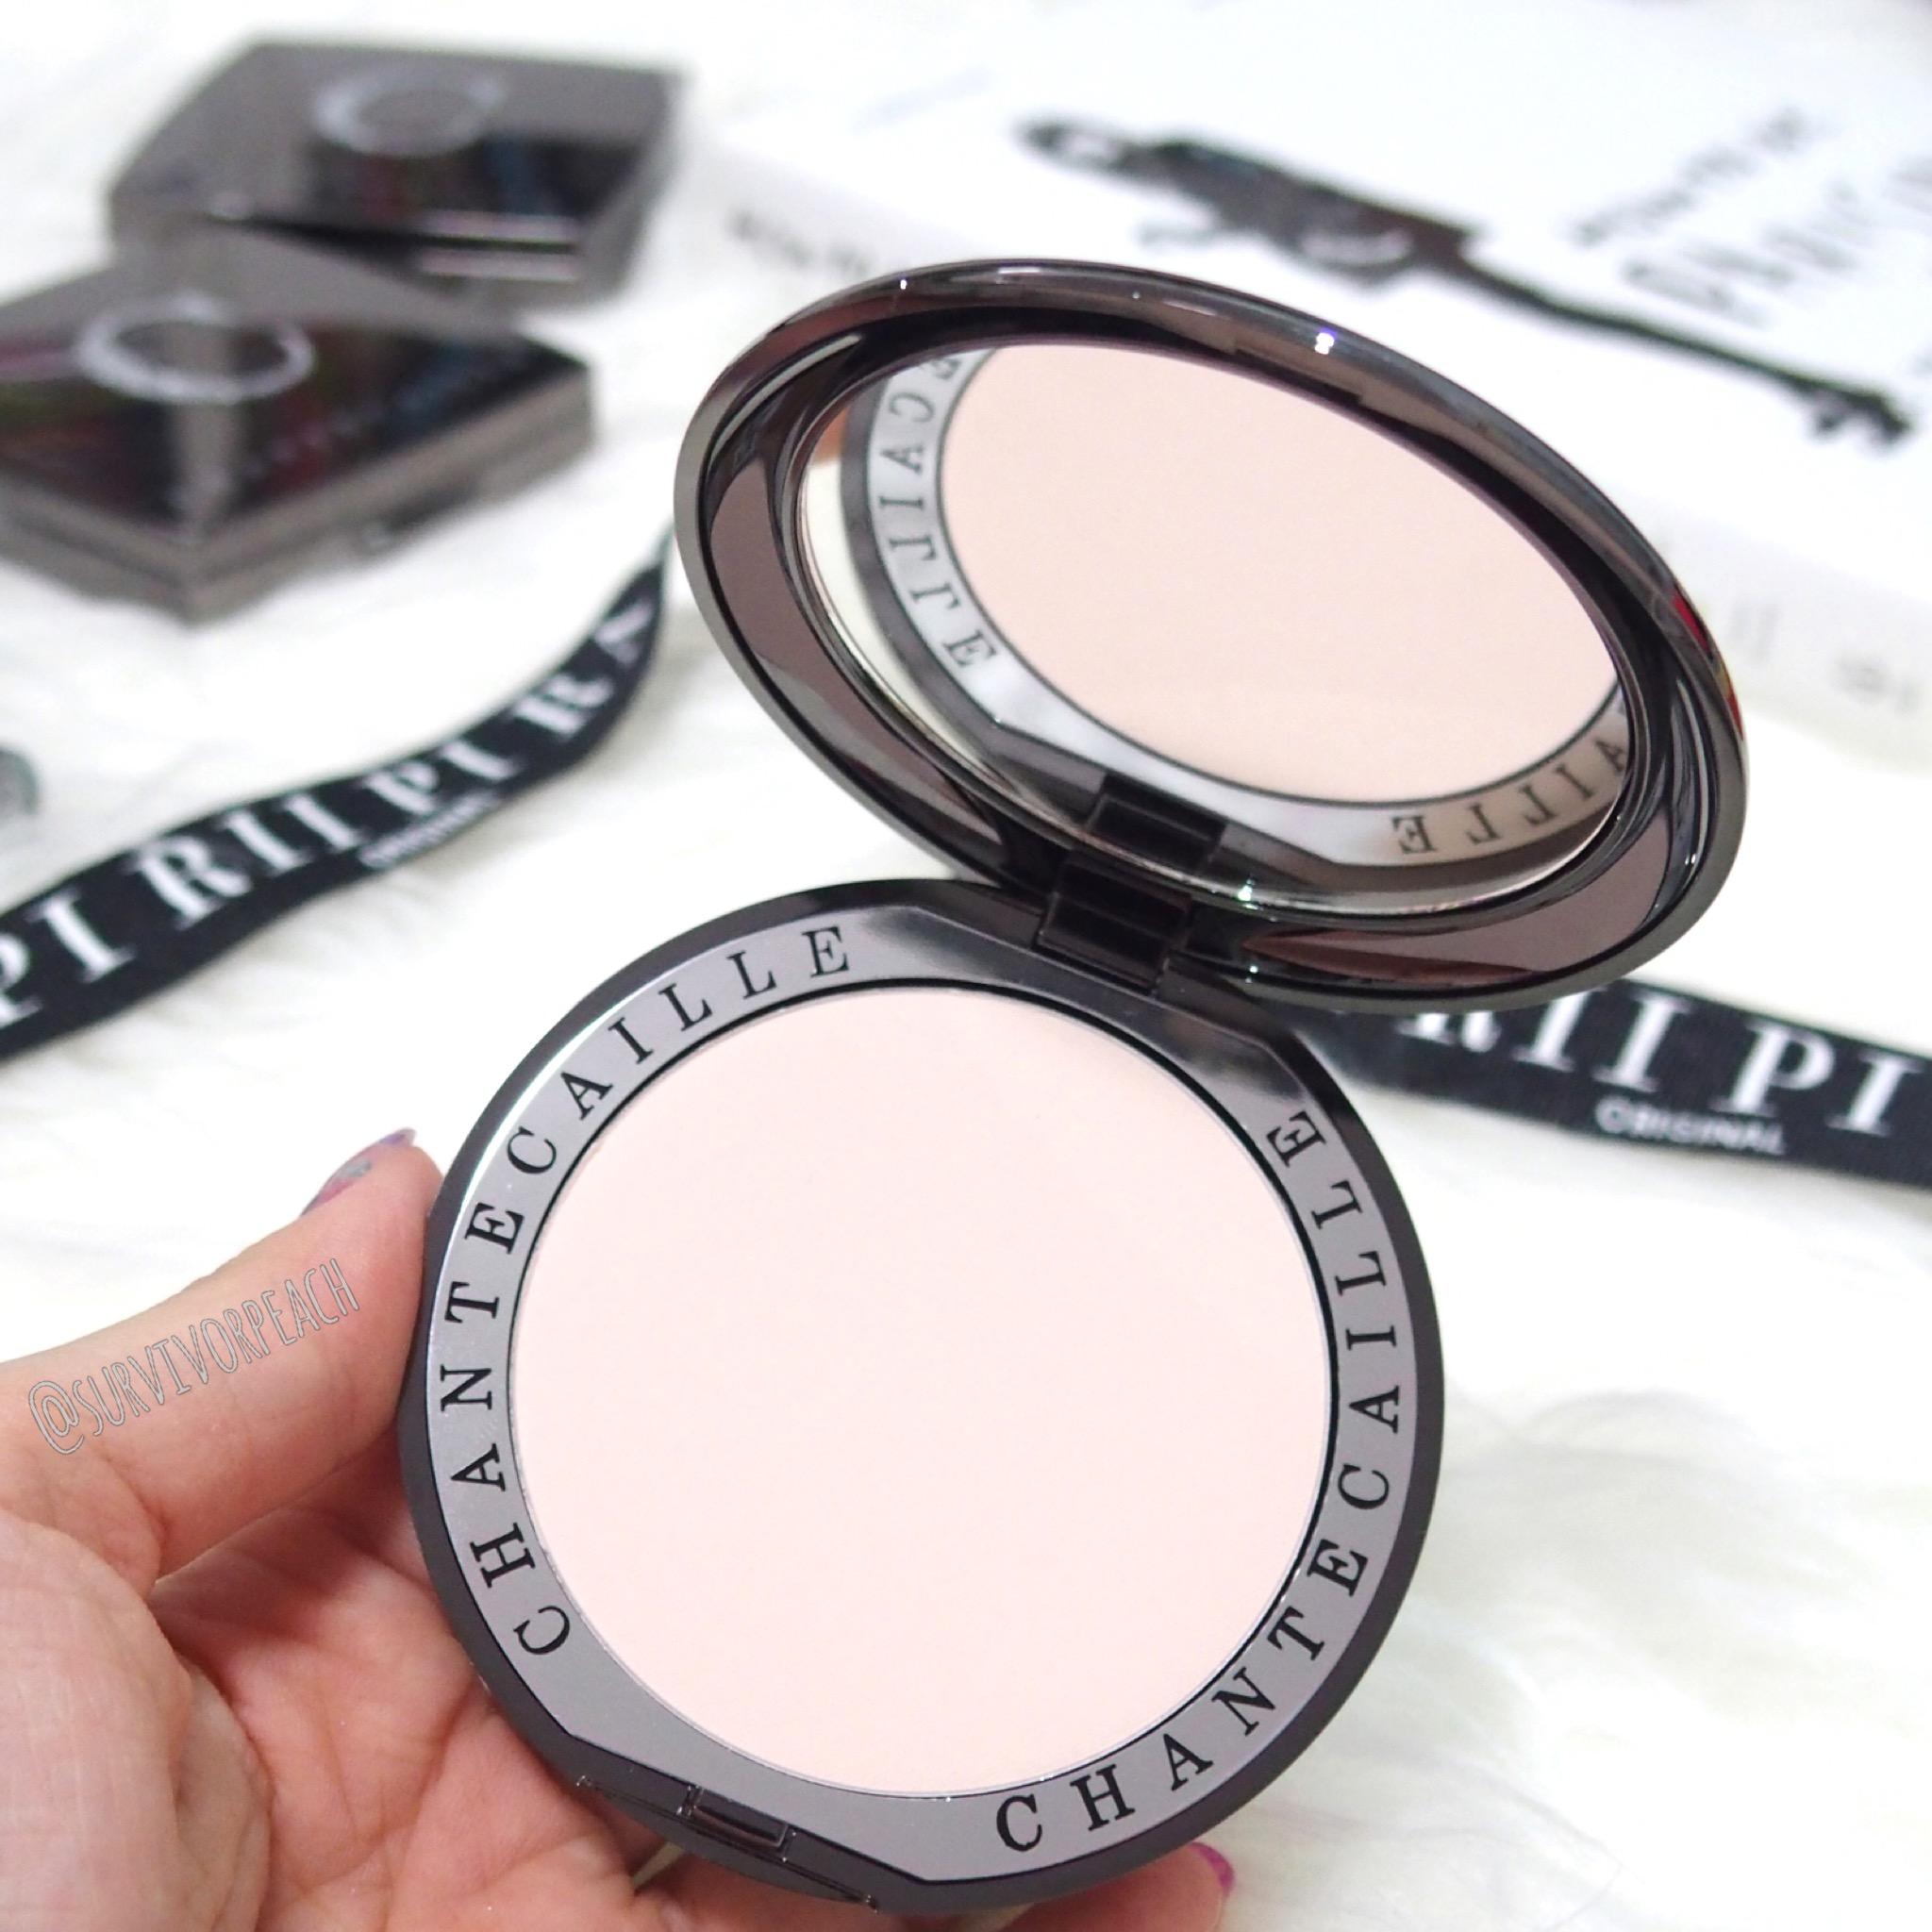 Chantecaille HD Perfecting powder